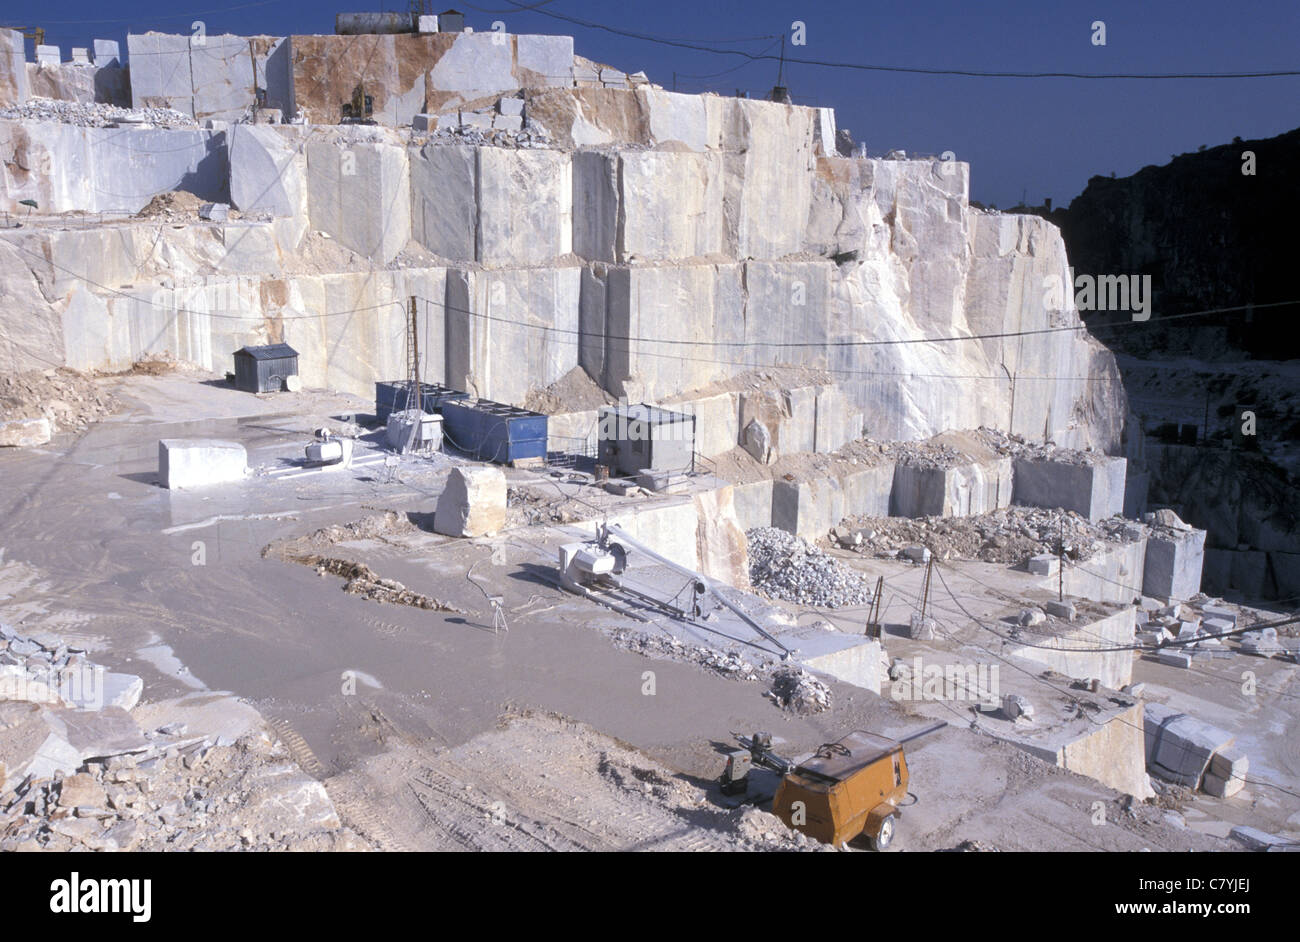 Italy Tuscany Apuan Alps Quarry Of Carrara Marble Stock